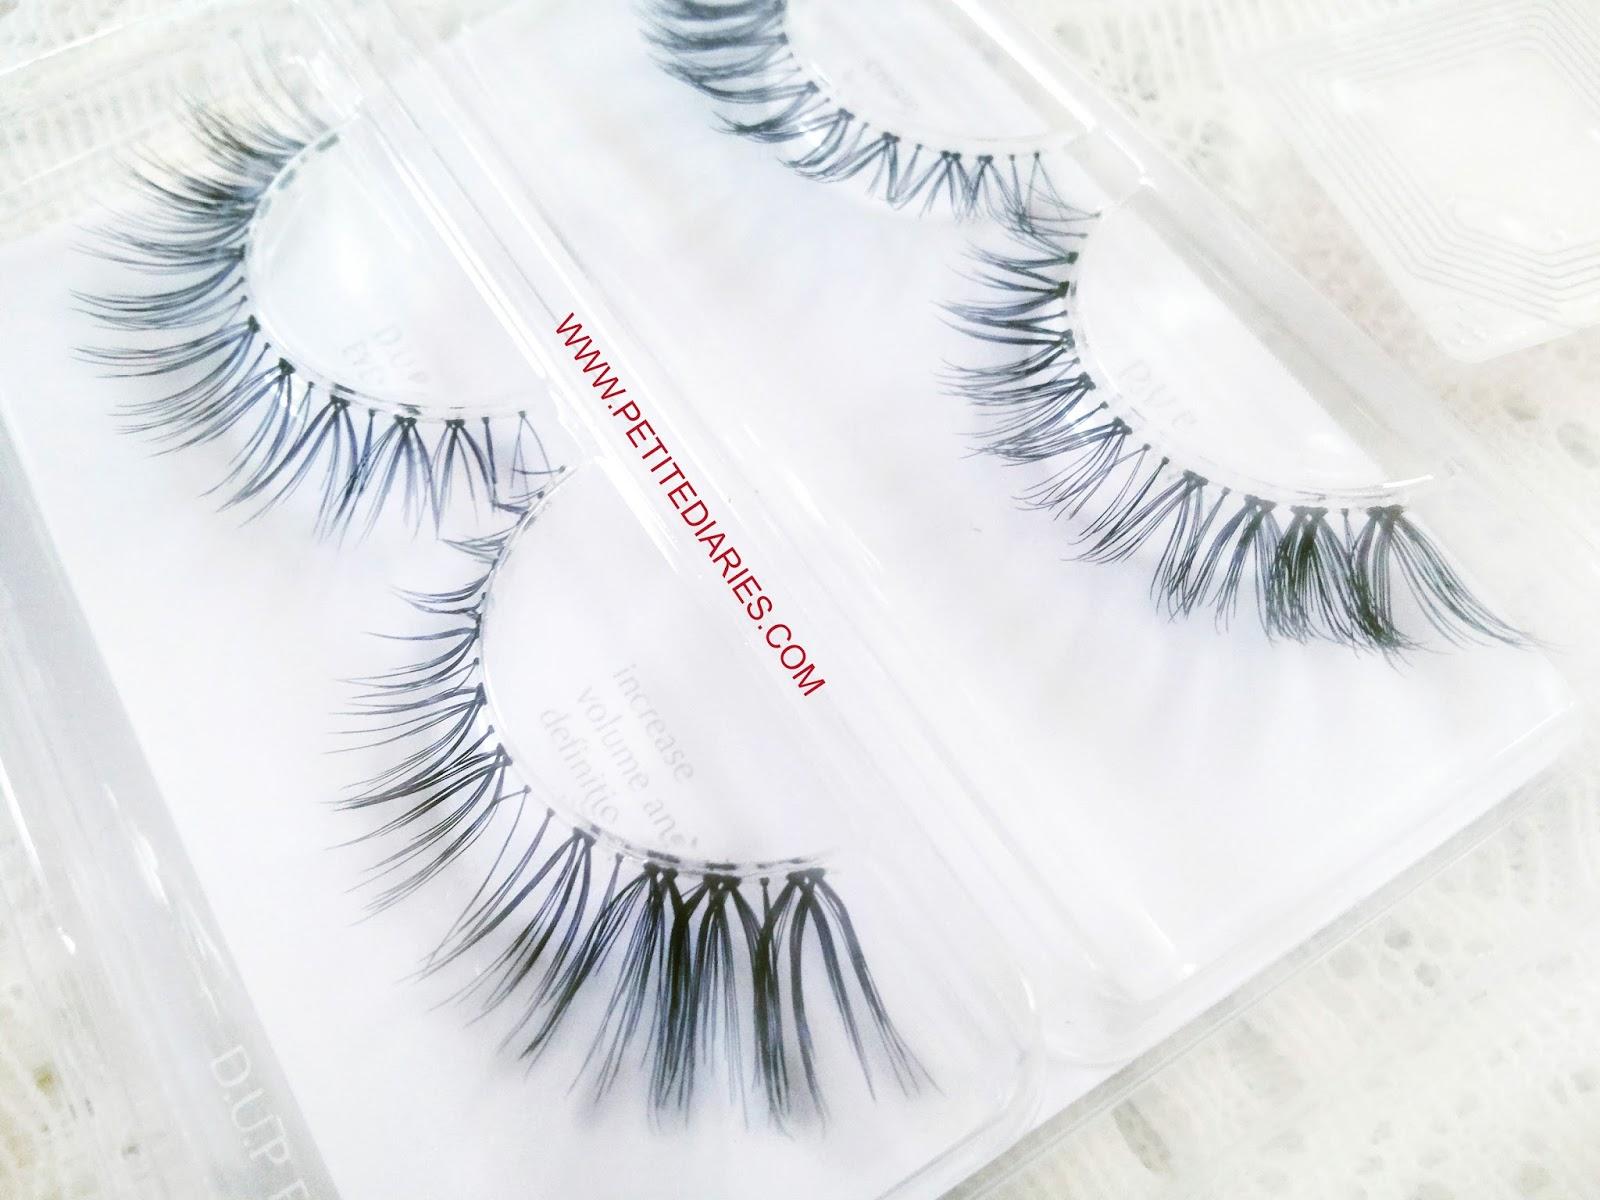 d.u.p eyelashes review